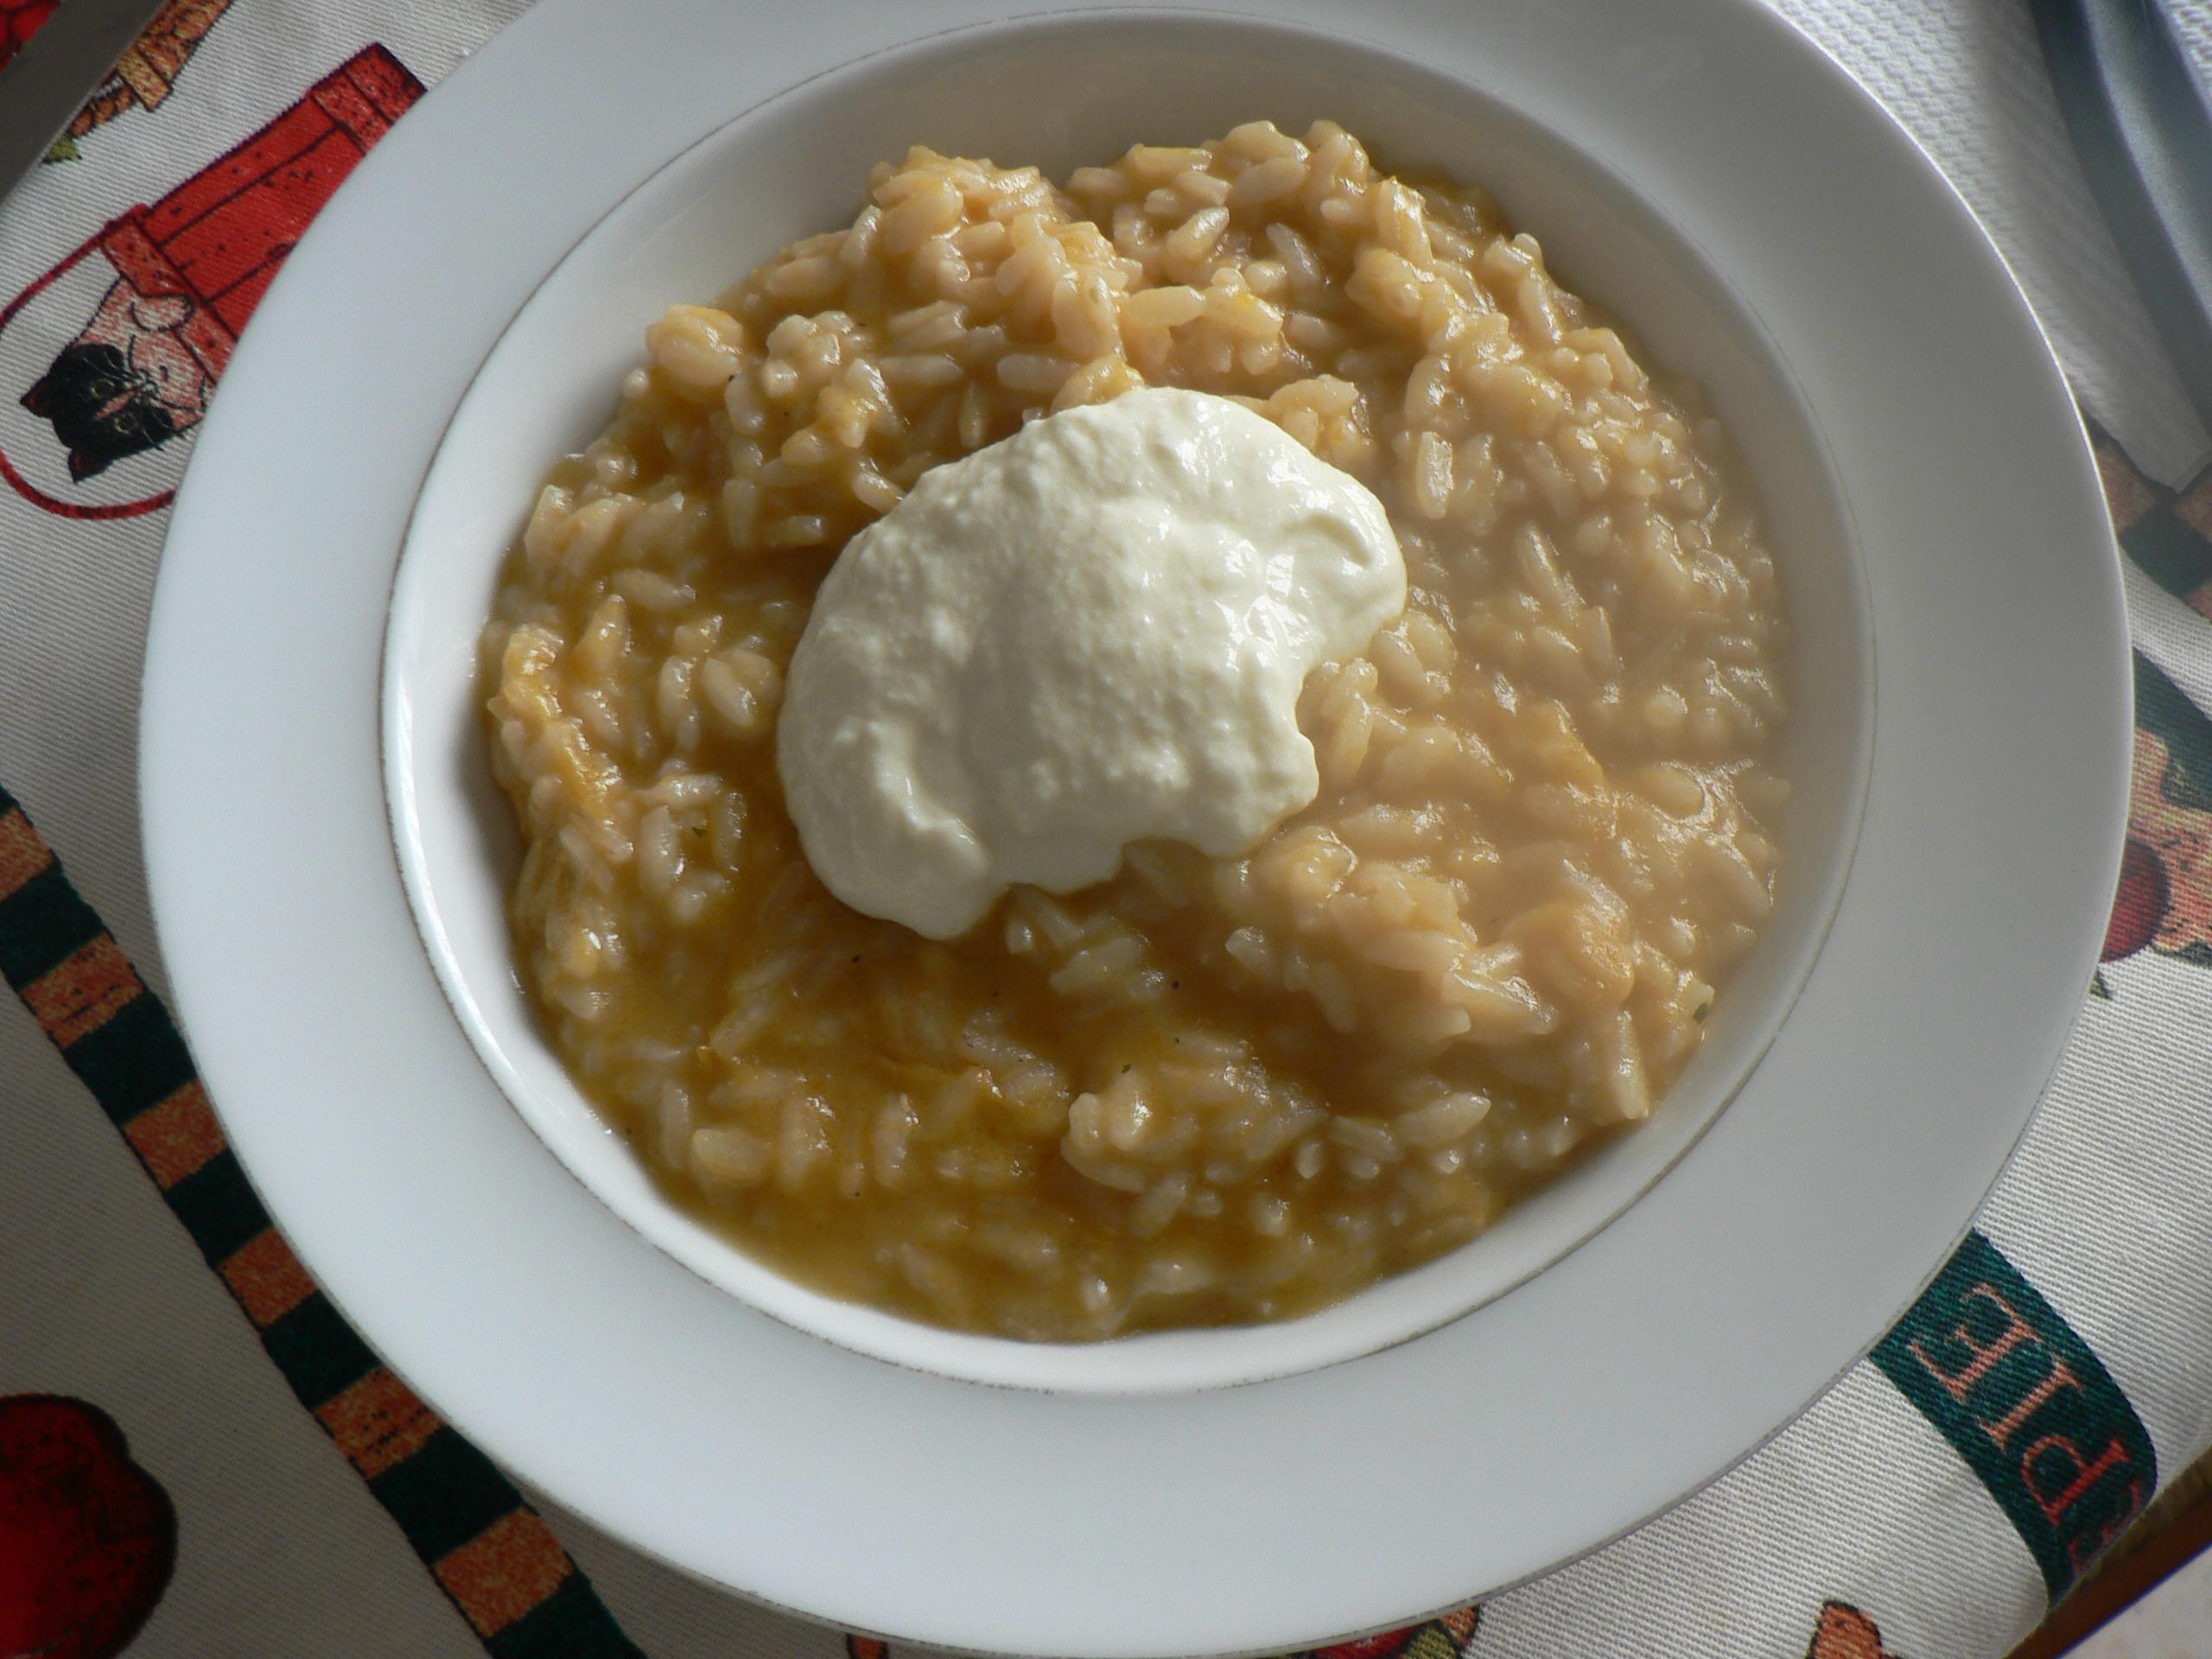 Ricette varie con panna da cucina home ricette segreti - Ricette con la panna da cucina ...